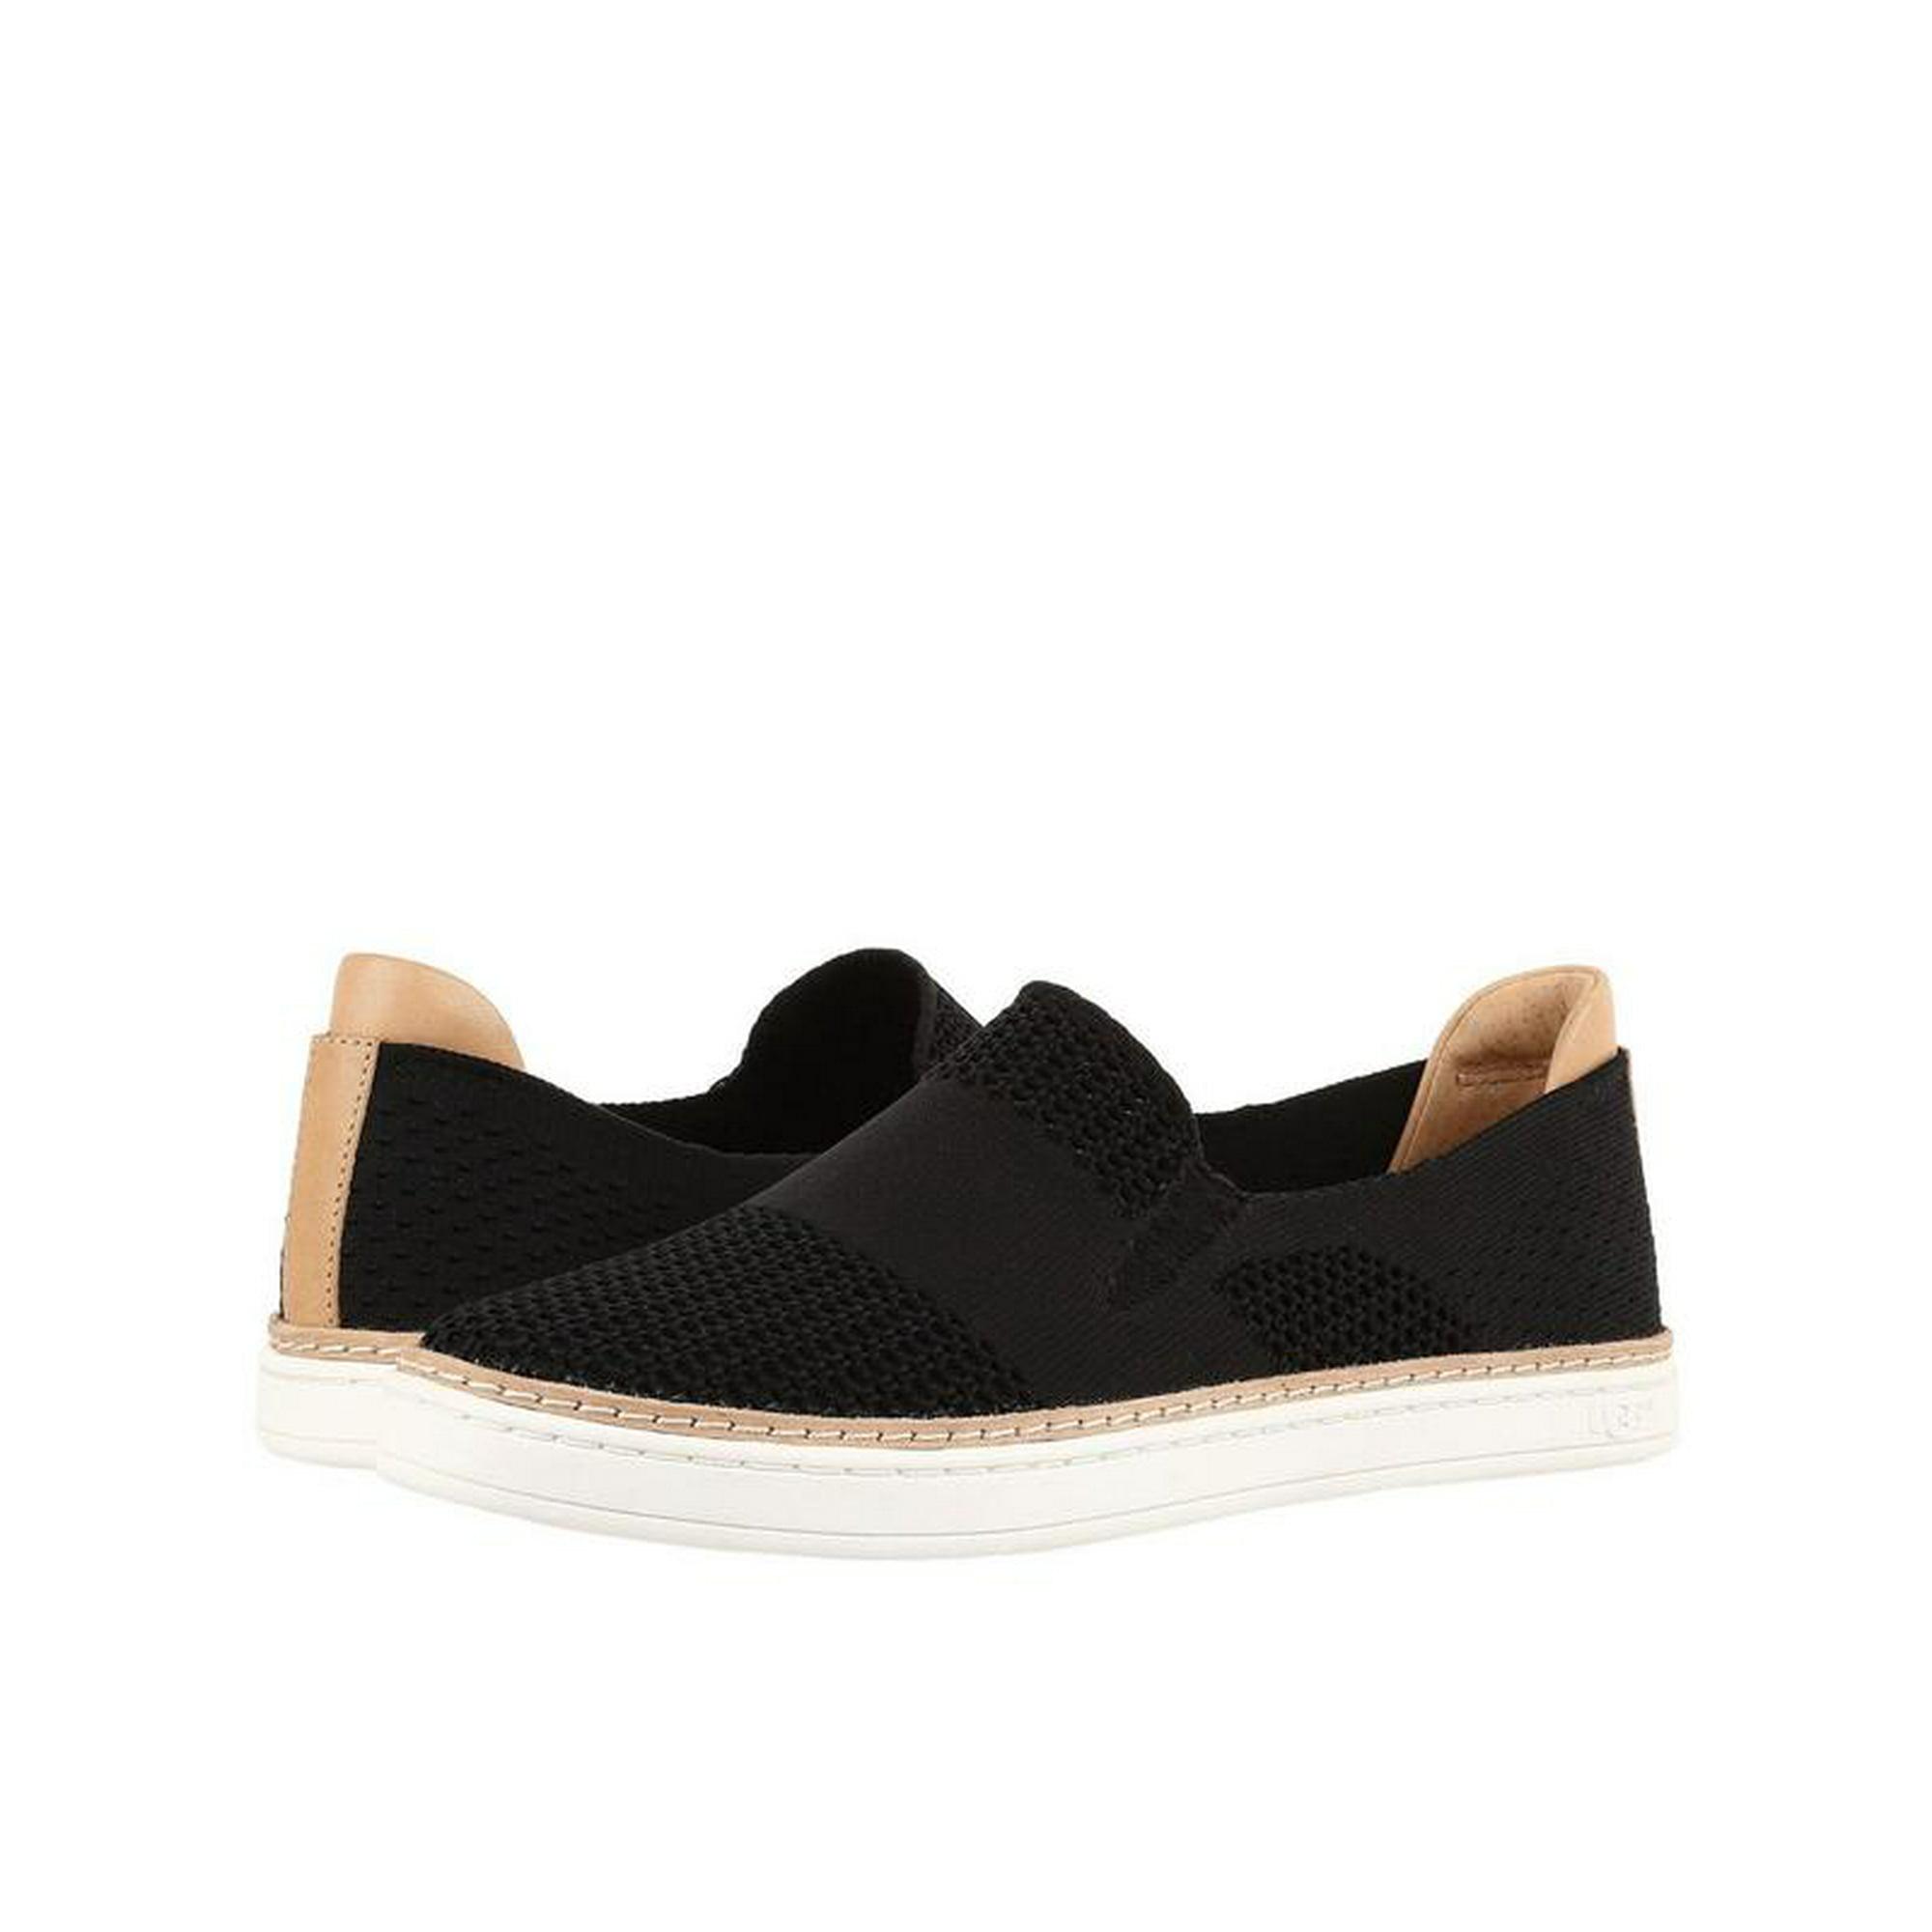 cf37abb7753 Buy UGG Australia Sammy Fashion Sneaker - Womens | Cheapest UGG ...